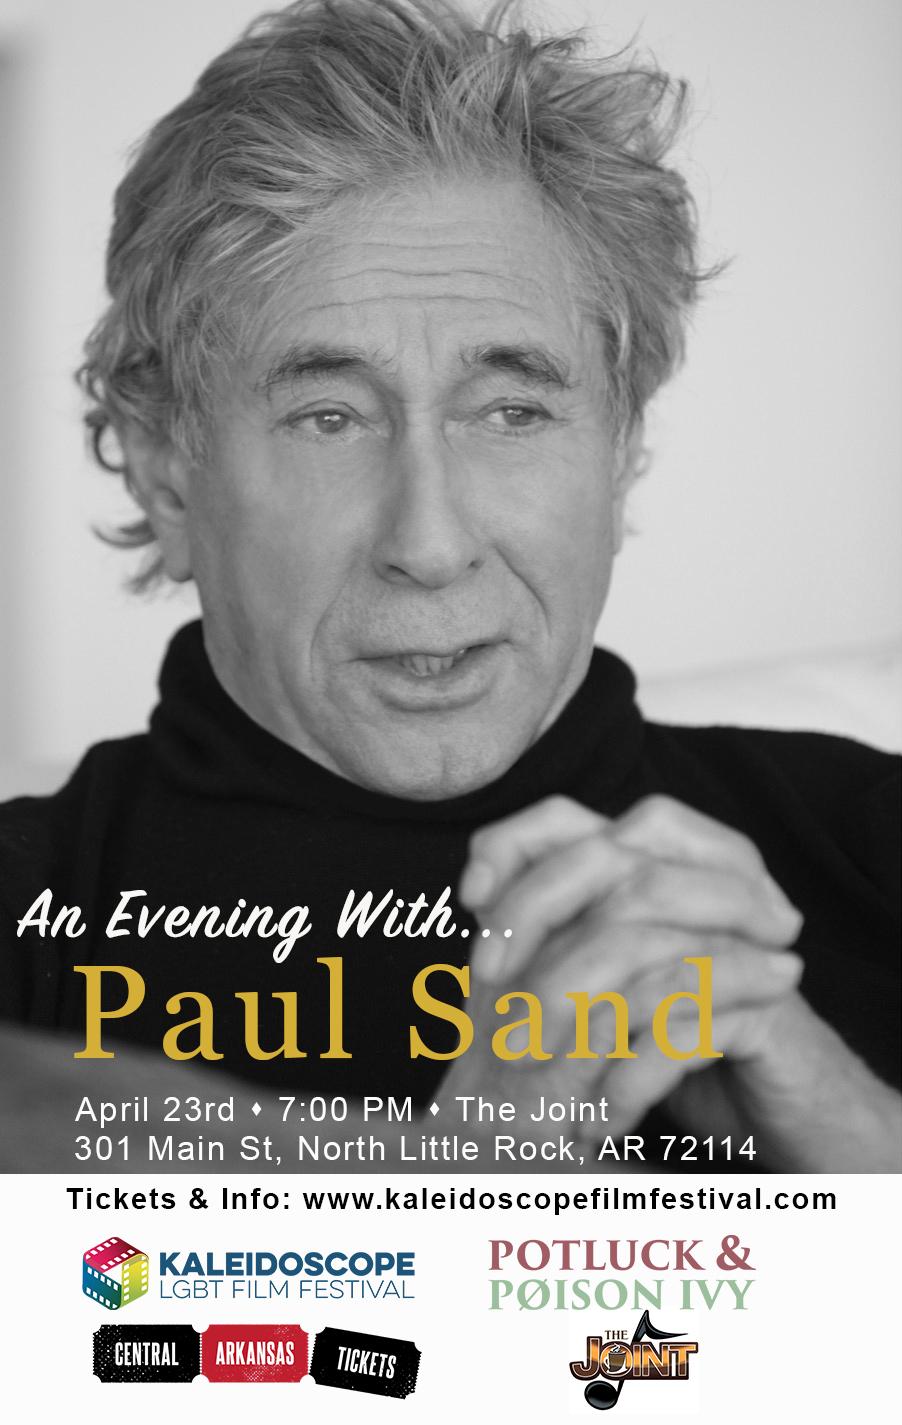 Paul Sand Event Poster.jpg